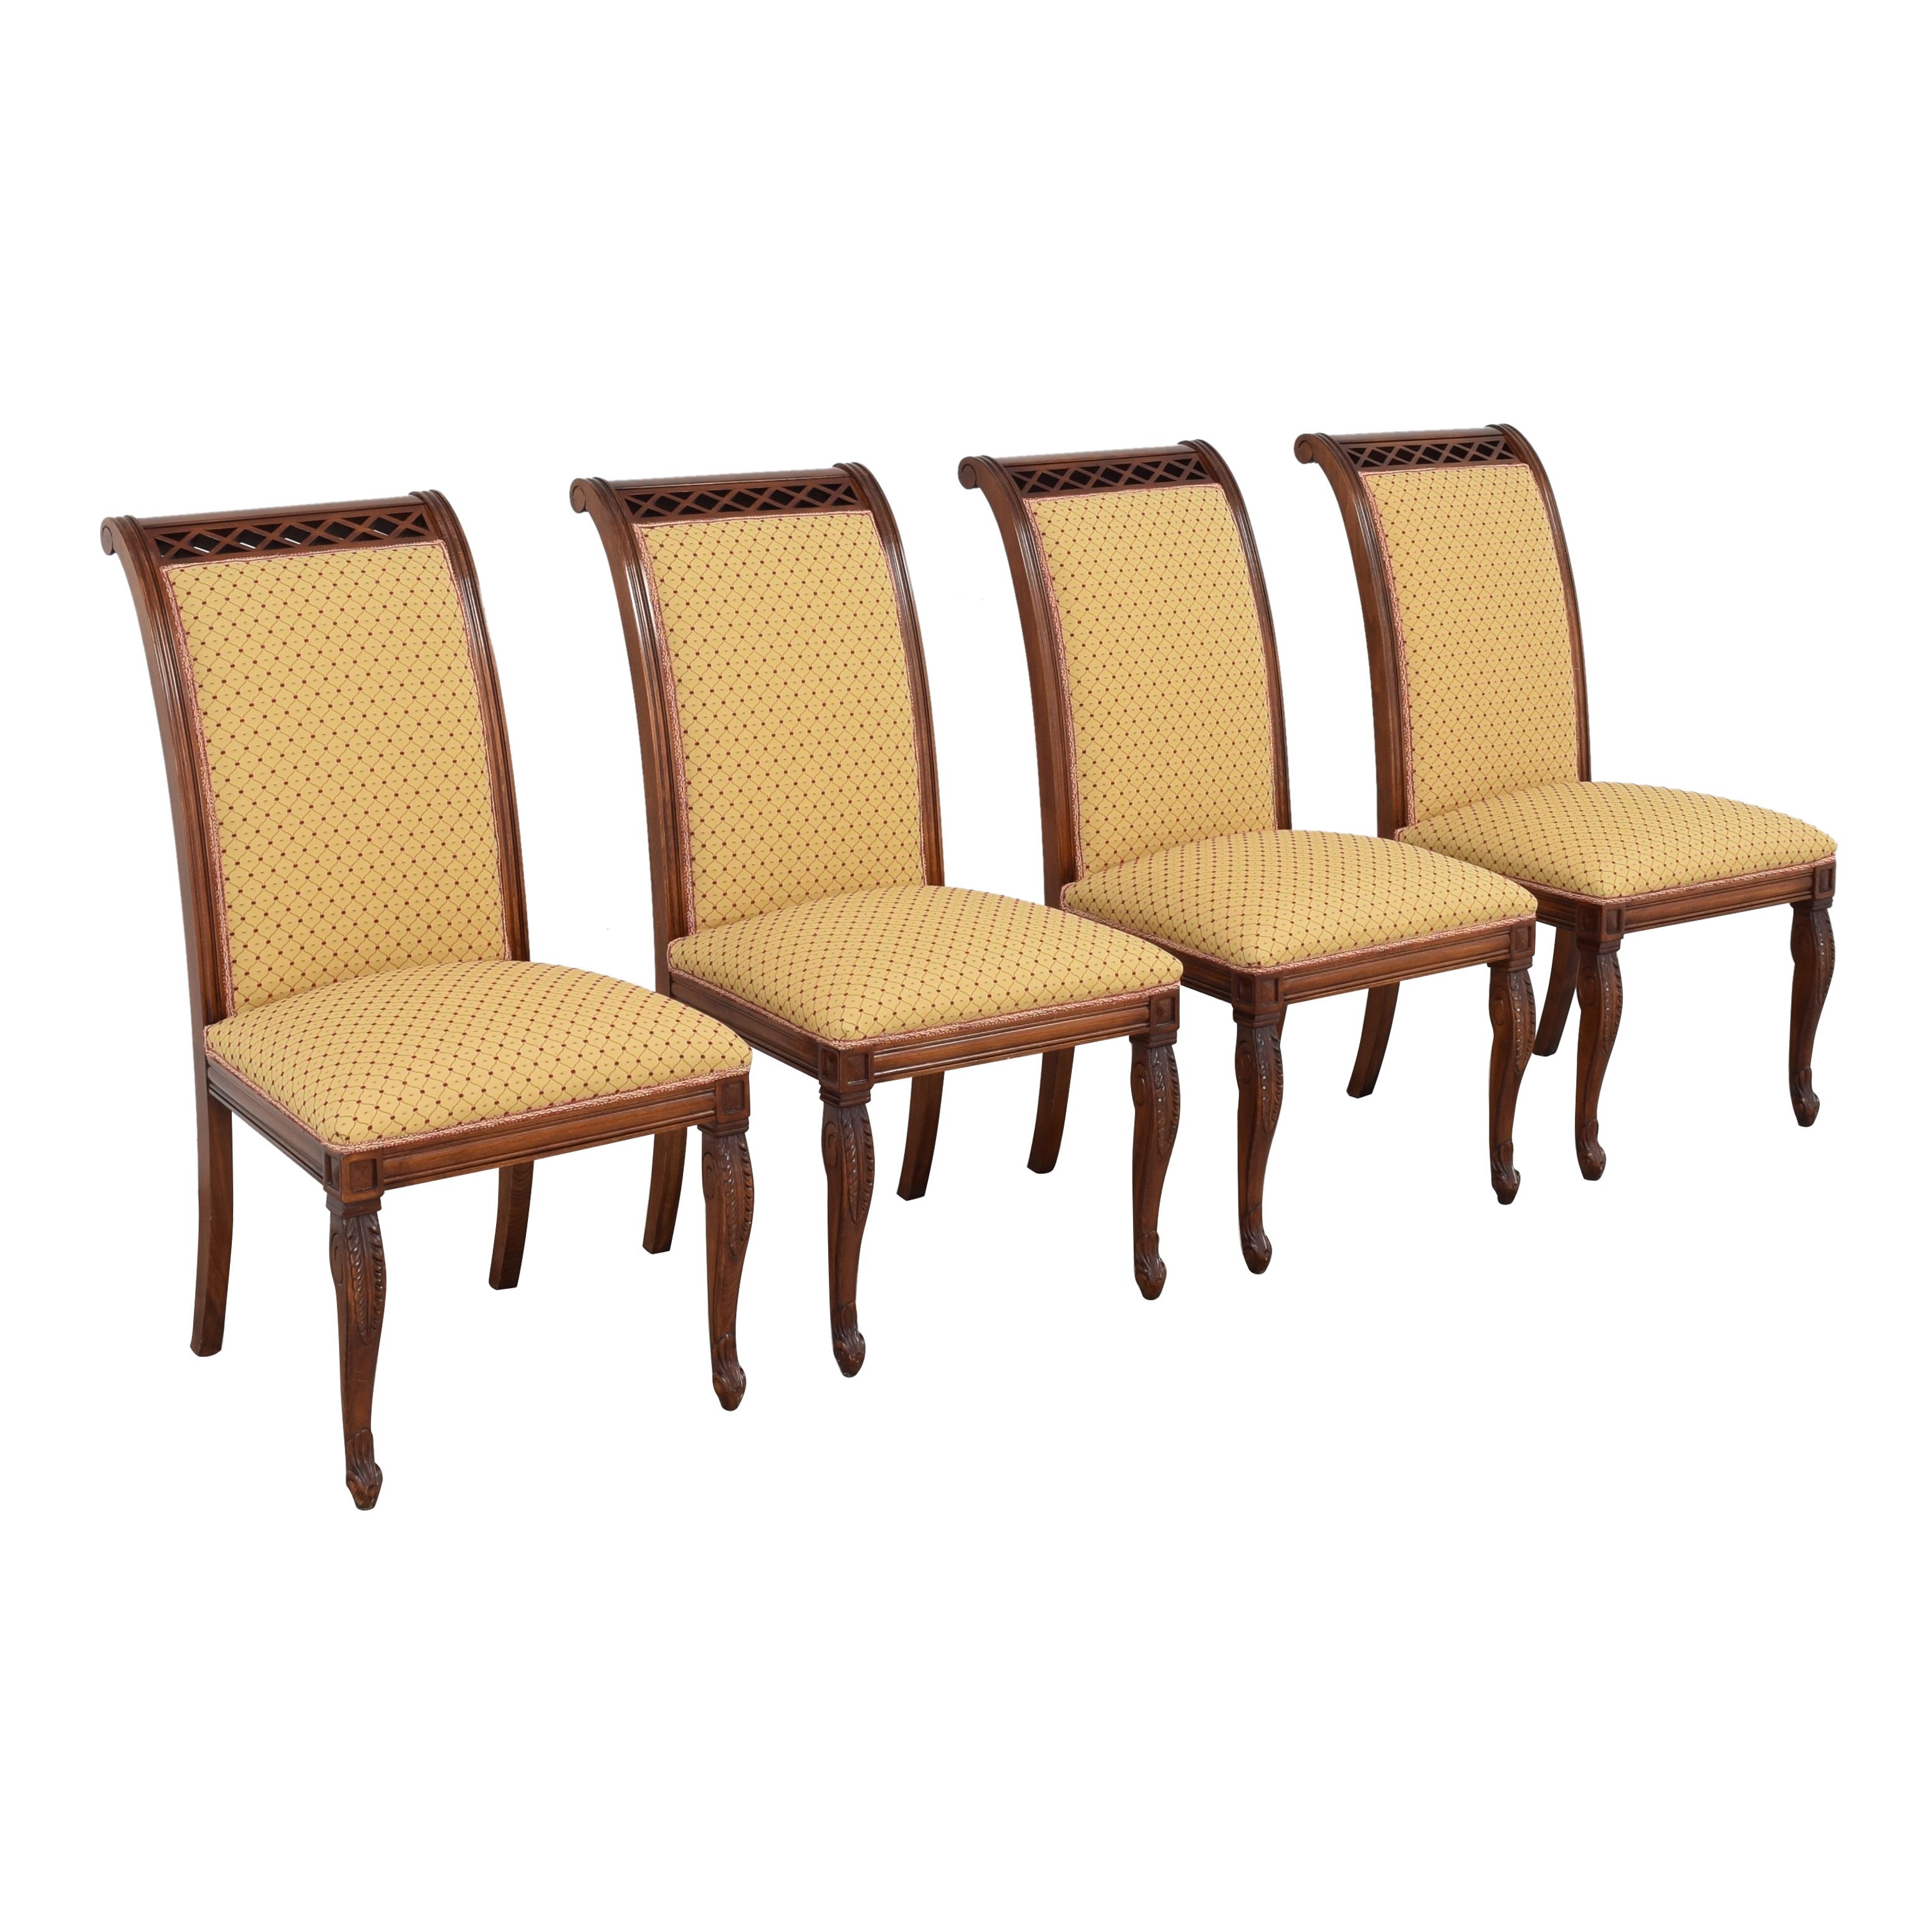 KPS Furnishings KPS Furnishings Custom Dining Chairs pa